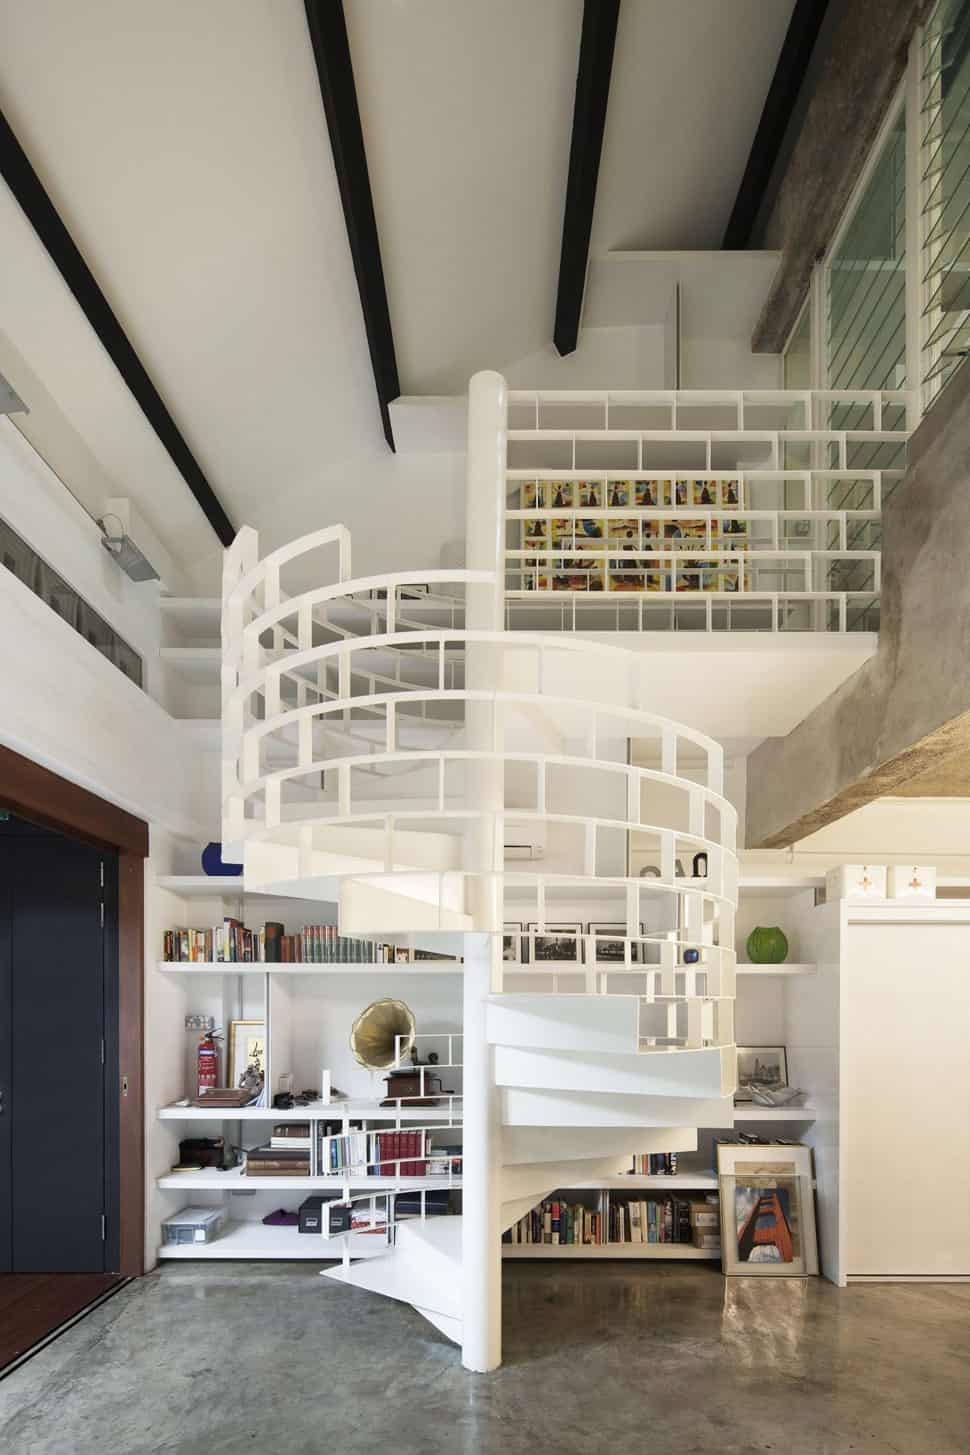 Luxury Loft Conversion Bedroom Design Ideas On Home Remodeling